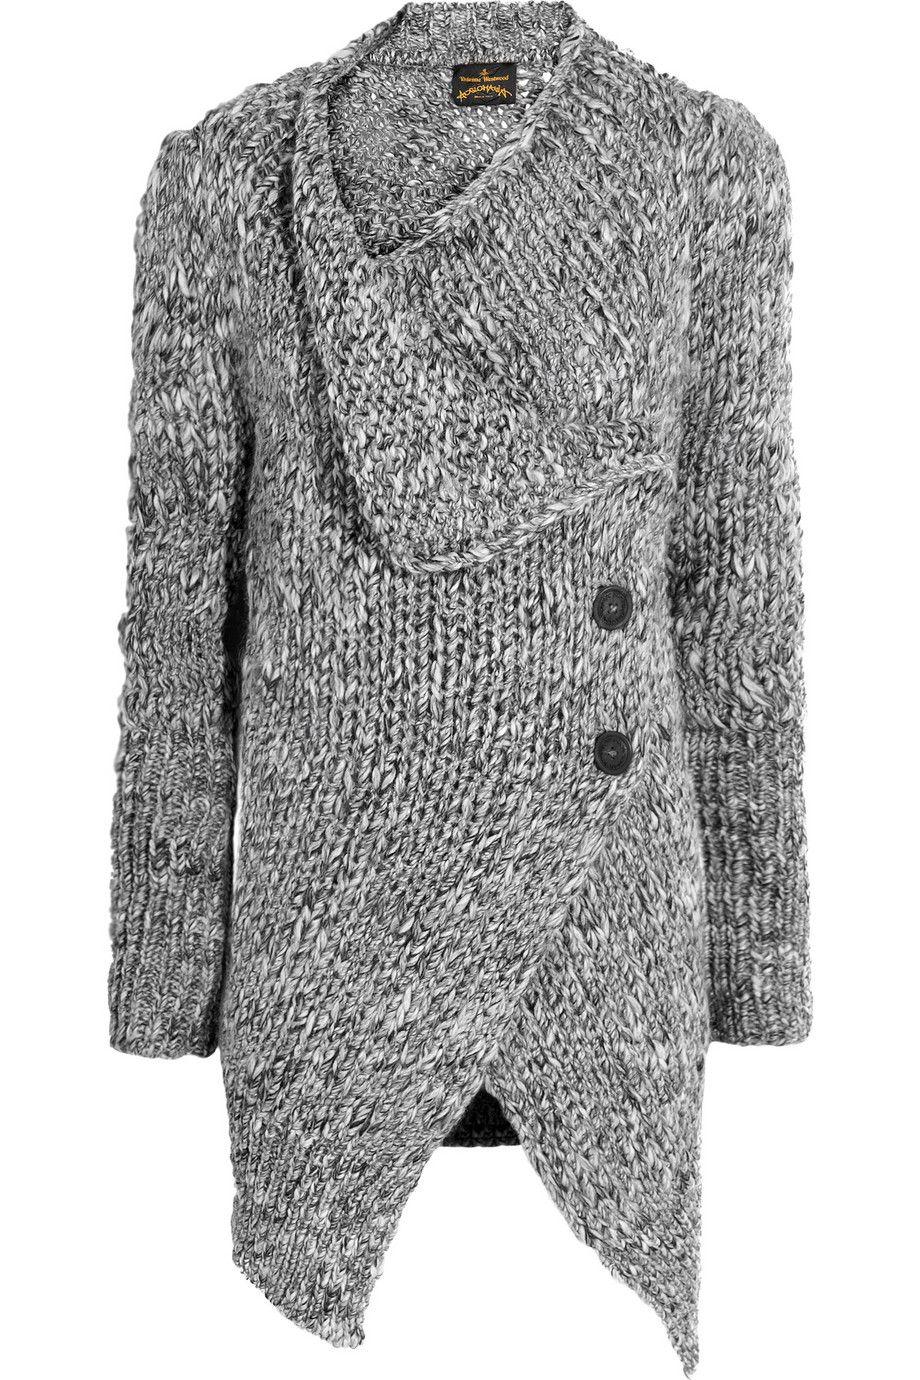 Vivienne Westwood Anglomania|Concordia wool-blend cardigan|NET-A-PORTER.COM